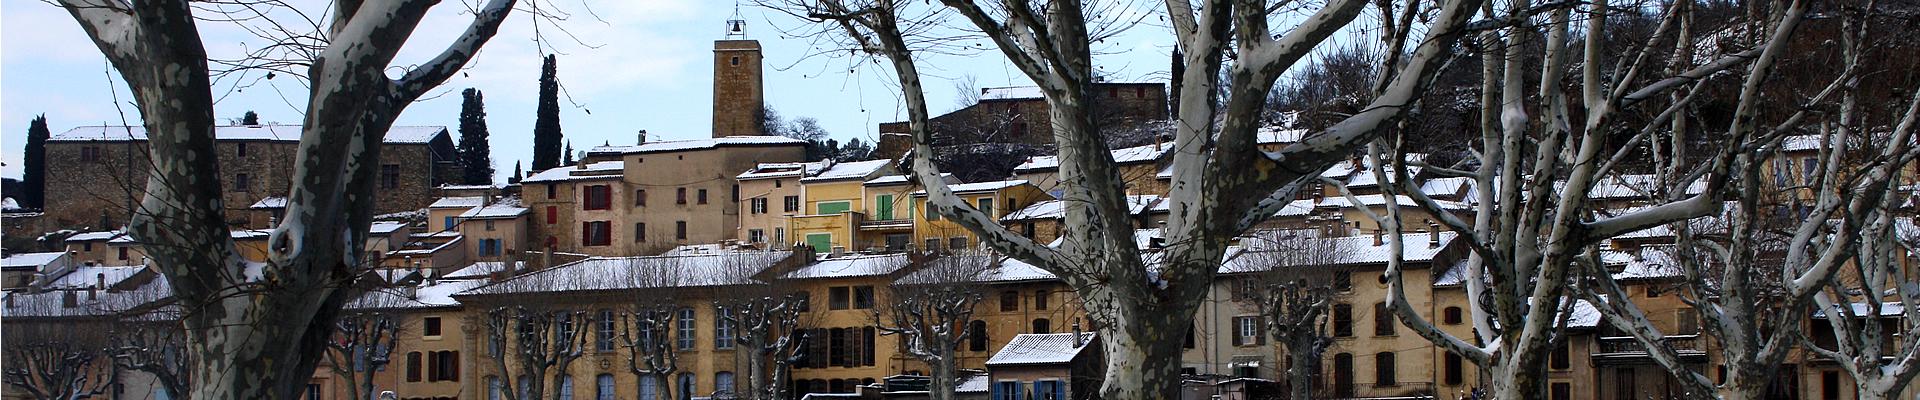 village_neige_IMG_3669